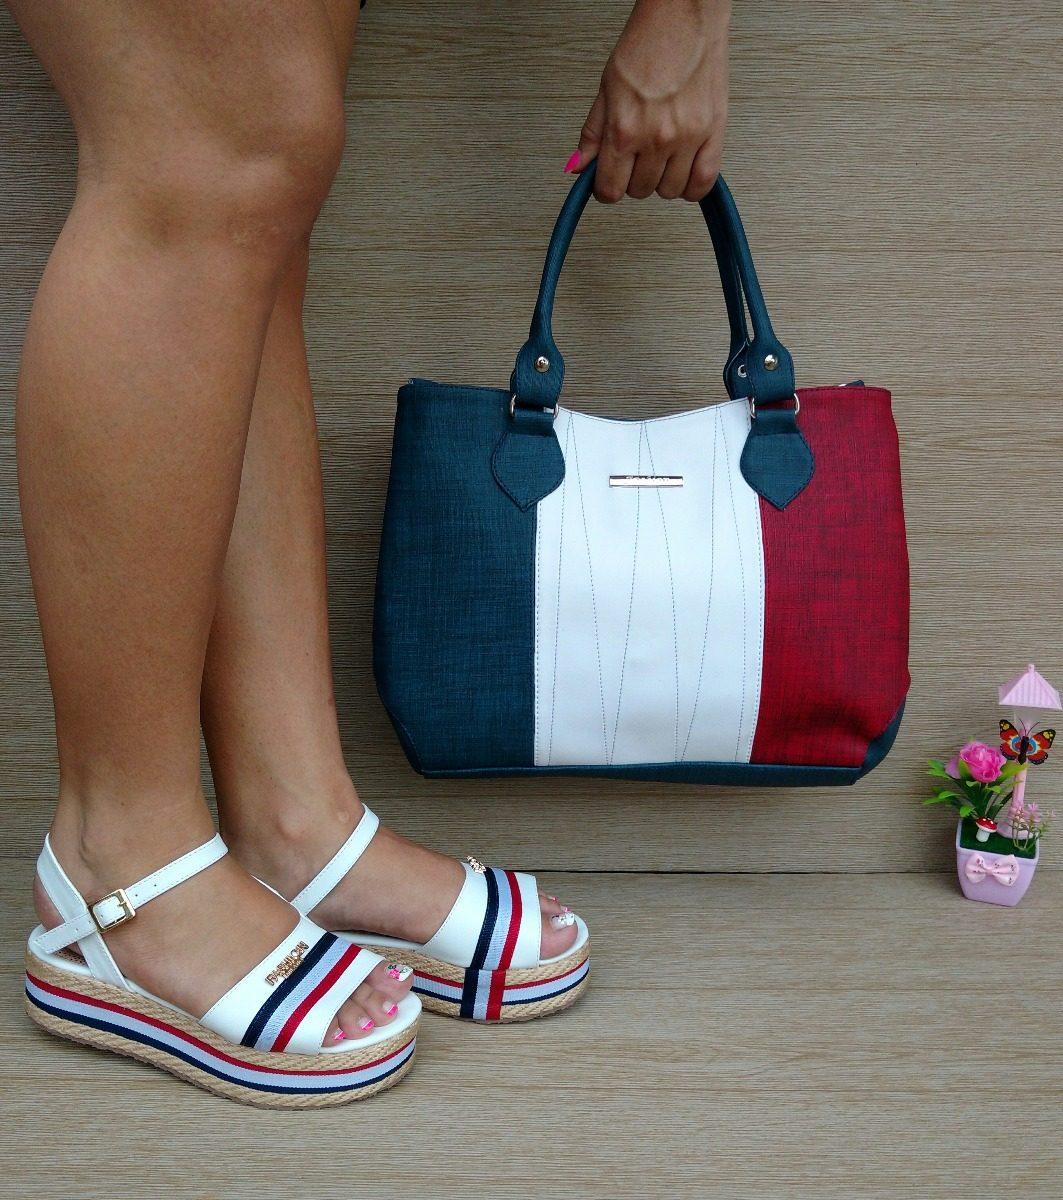 a9576be54 conjunto bolso blanco rojo azul + sandalia blanca yute moda. Cargando zoom.